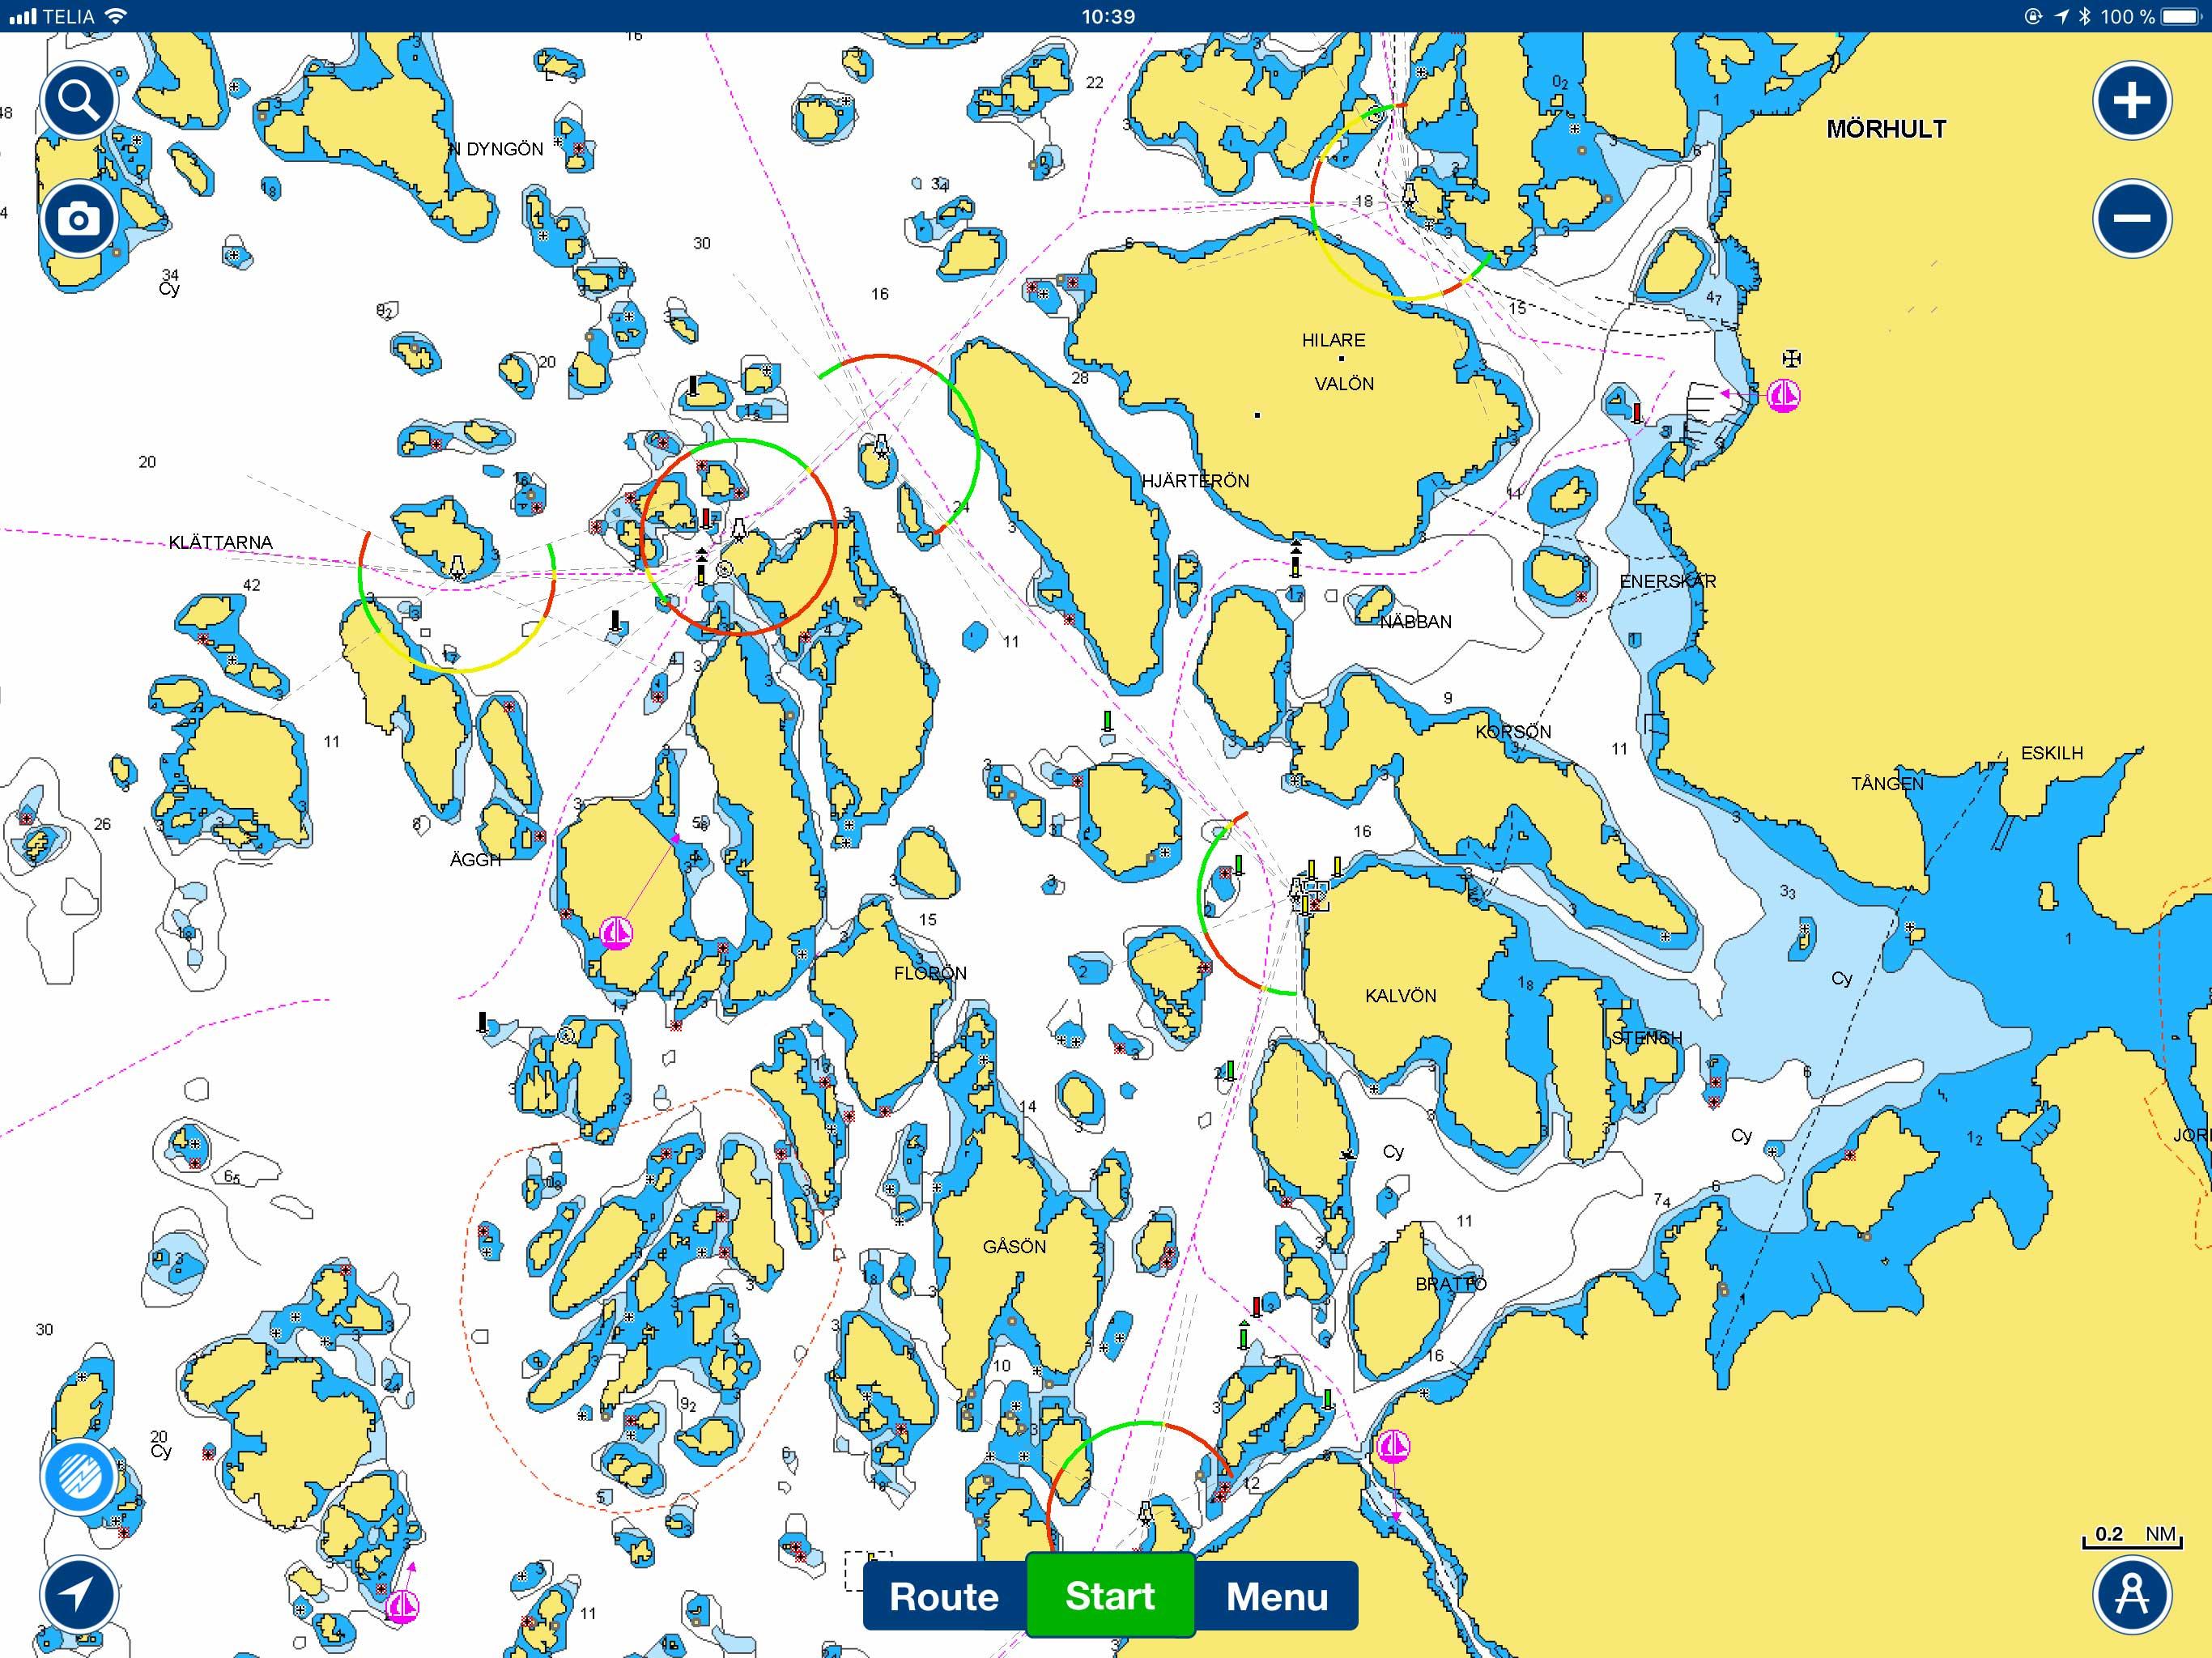 archipelago_navionics.jpg